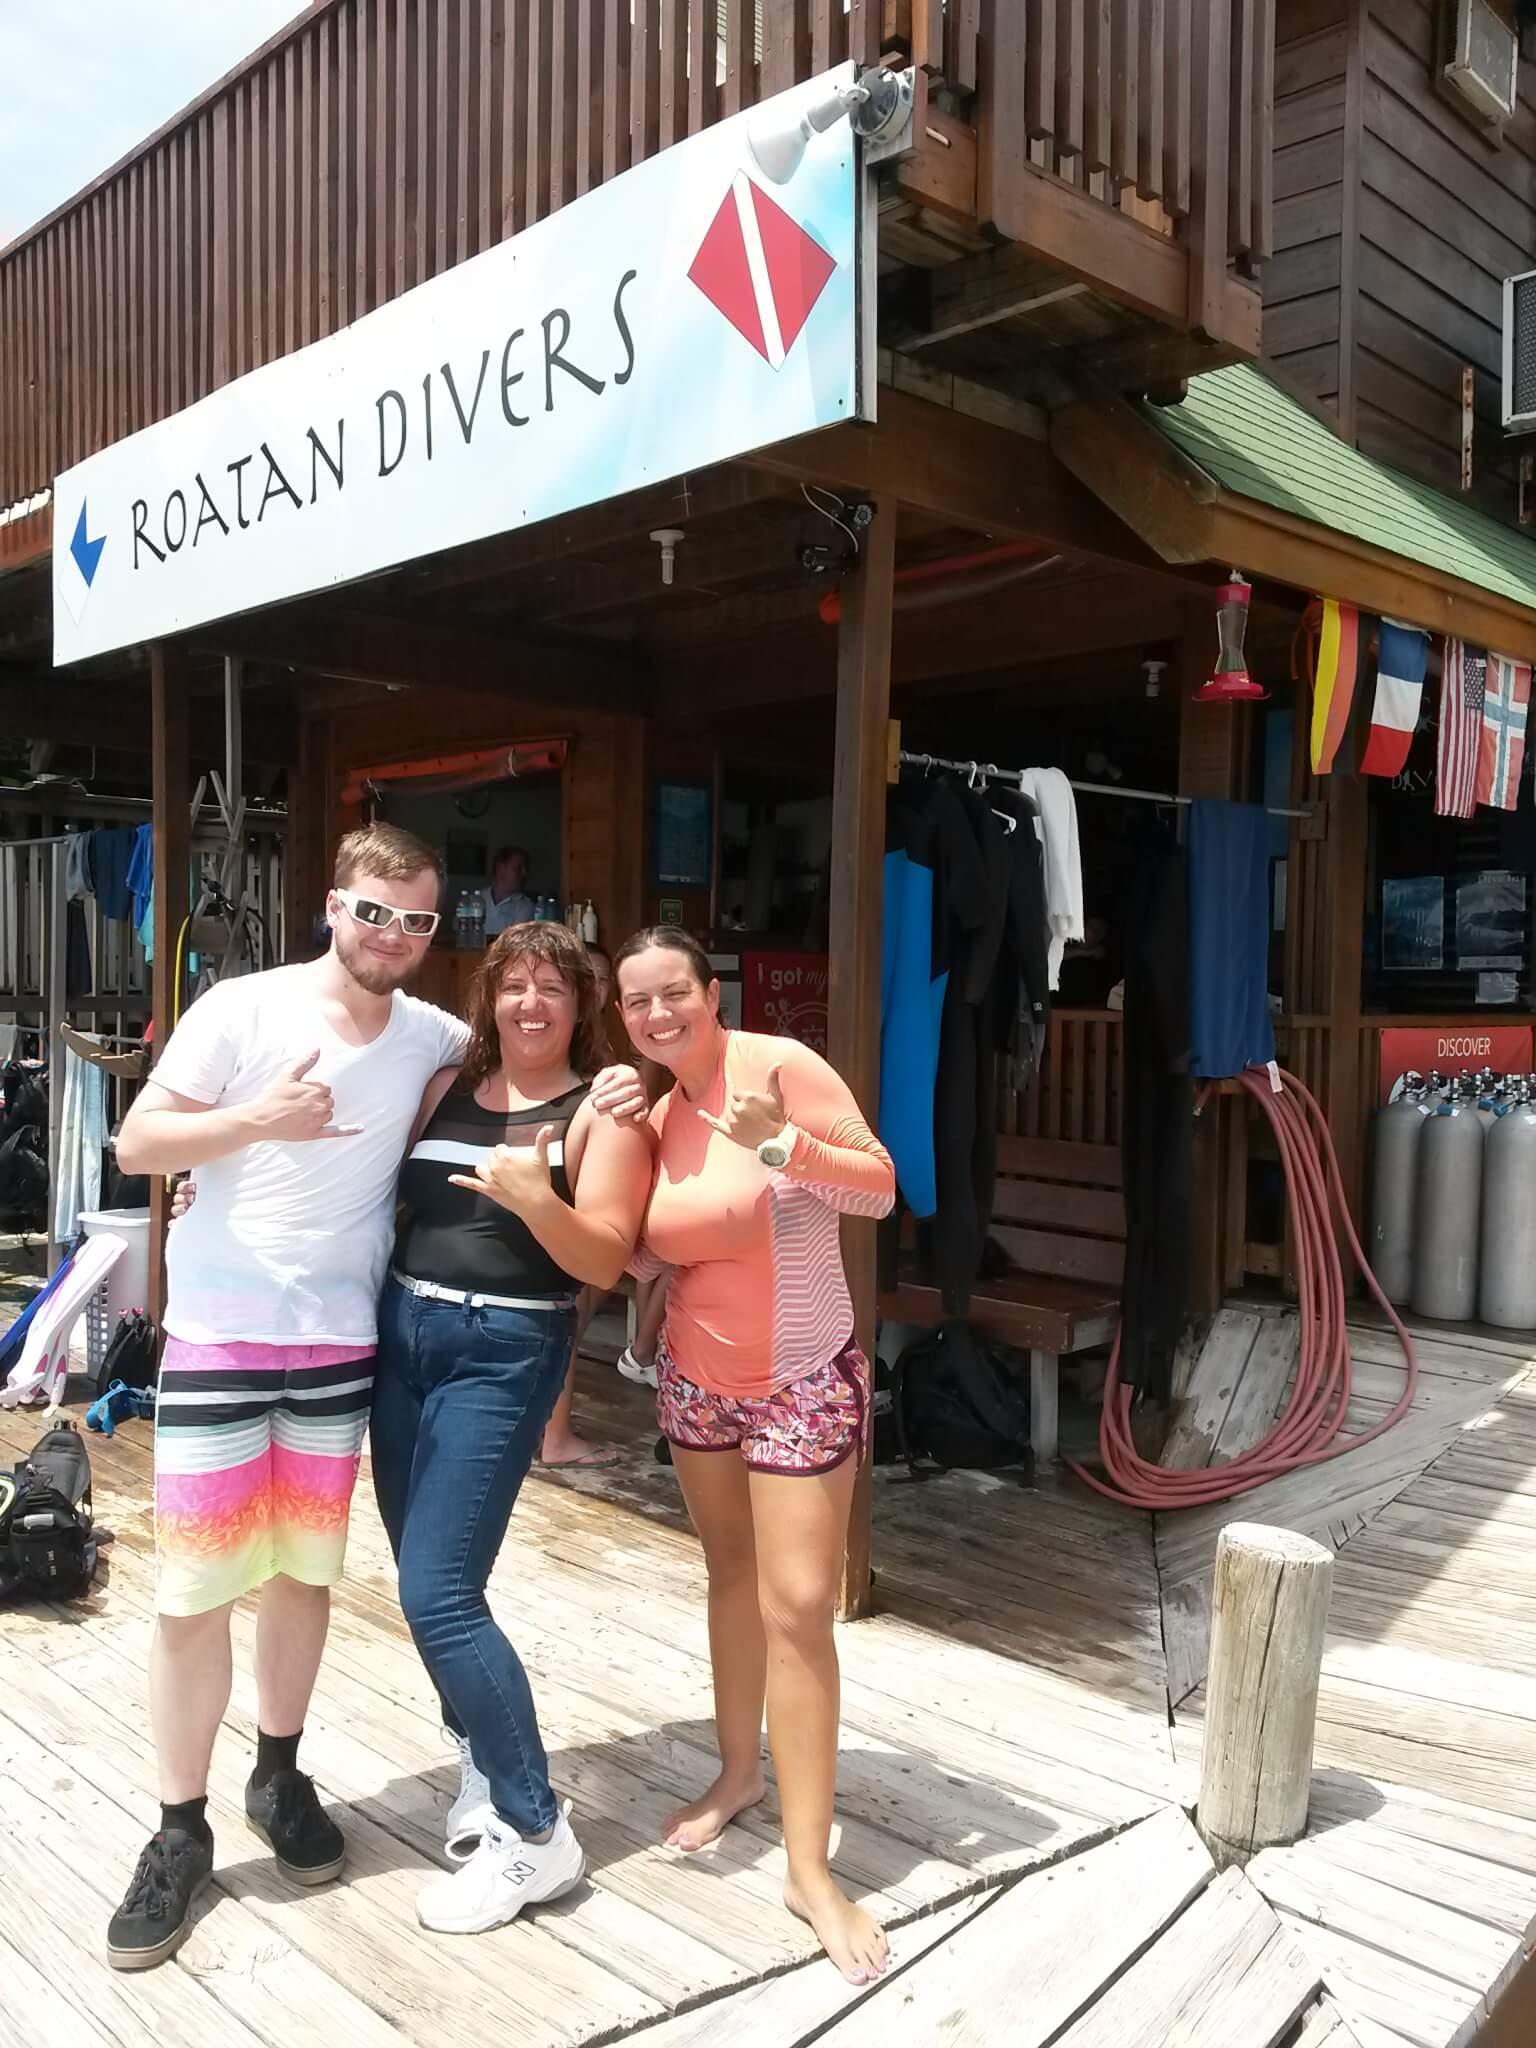 try scuba diving Roatan